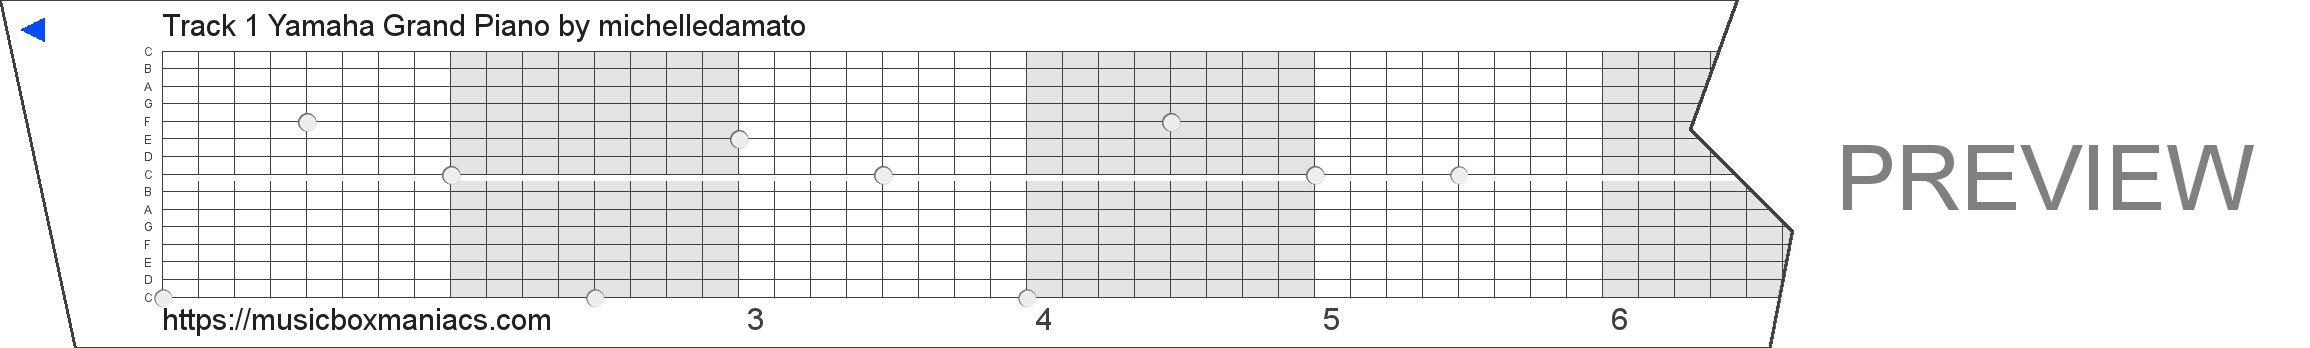 Track 1 Yamaha Grand Piano 15 note music box paper strip